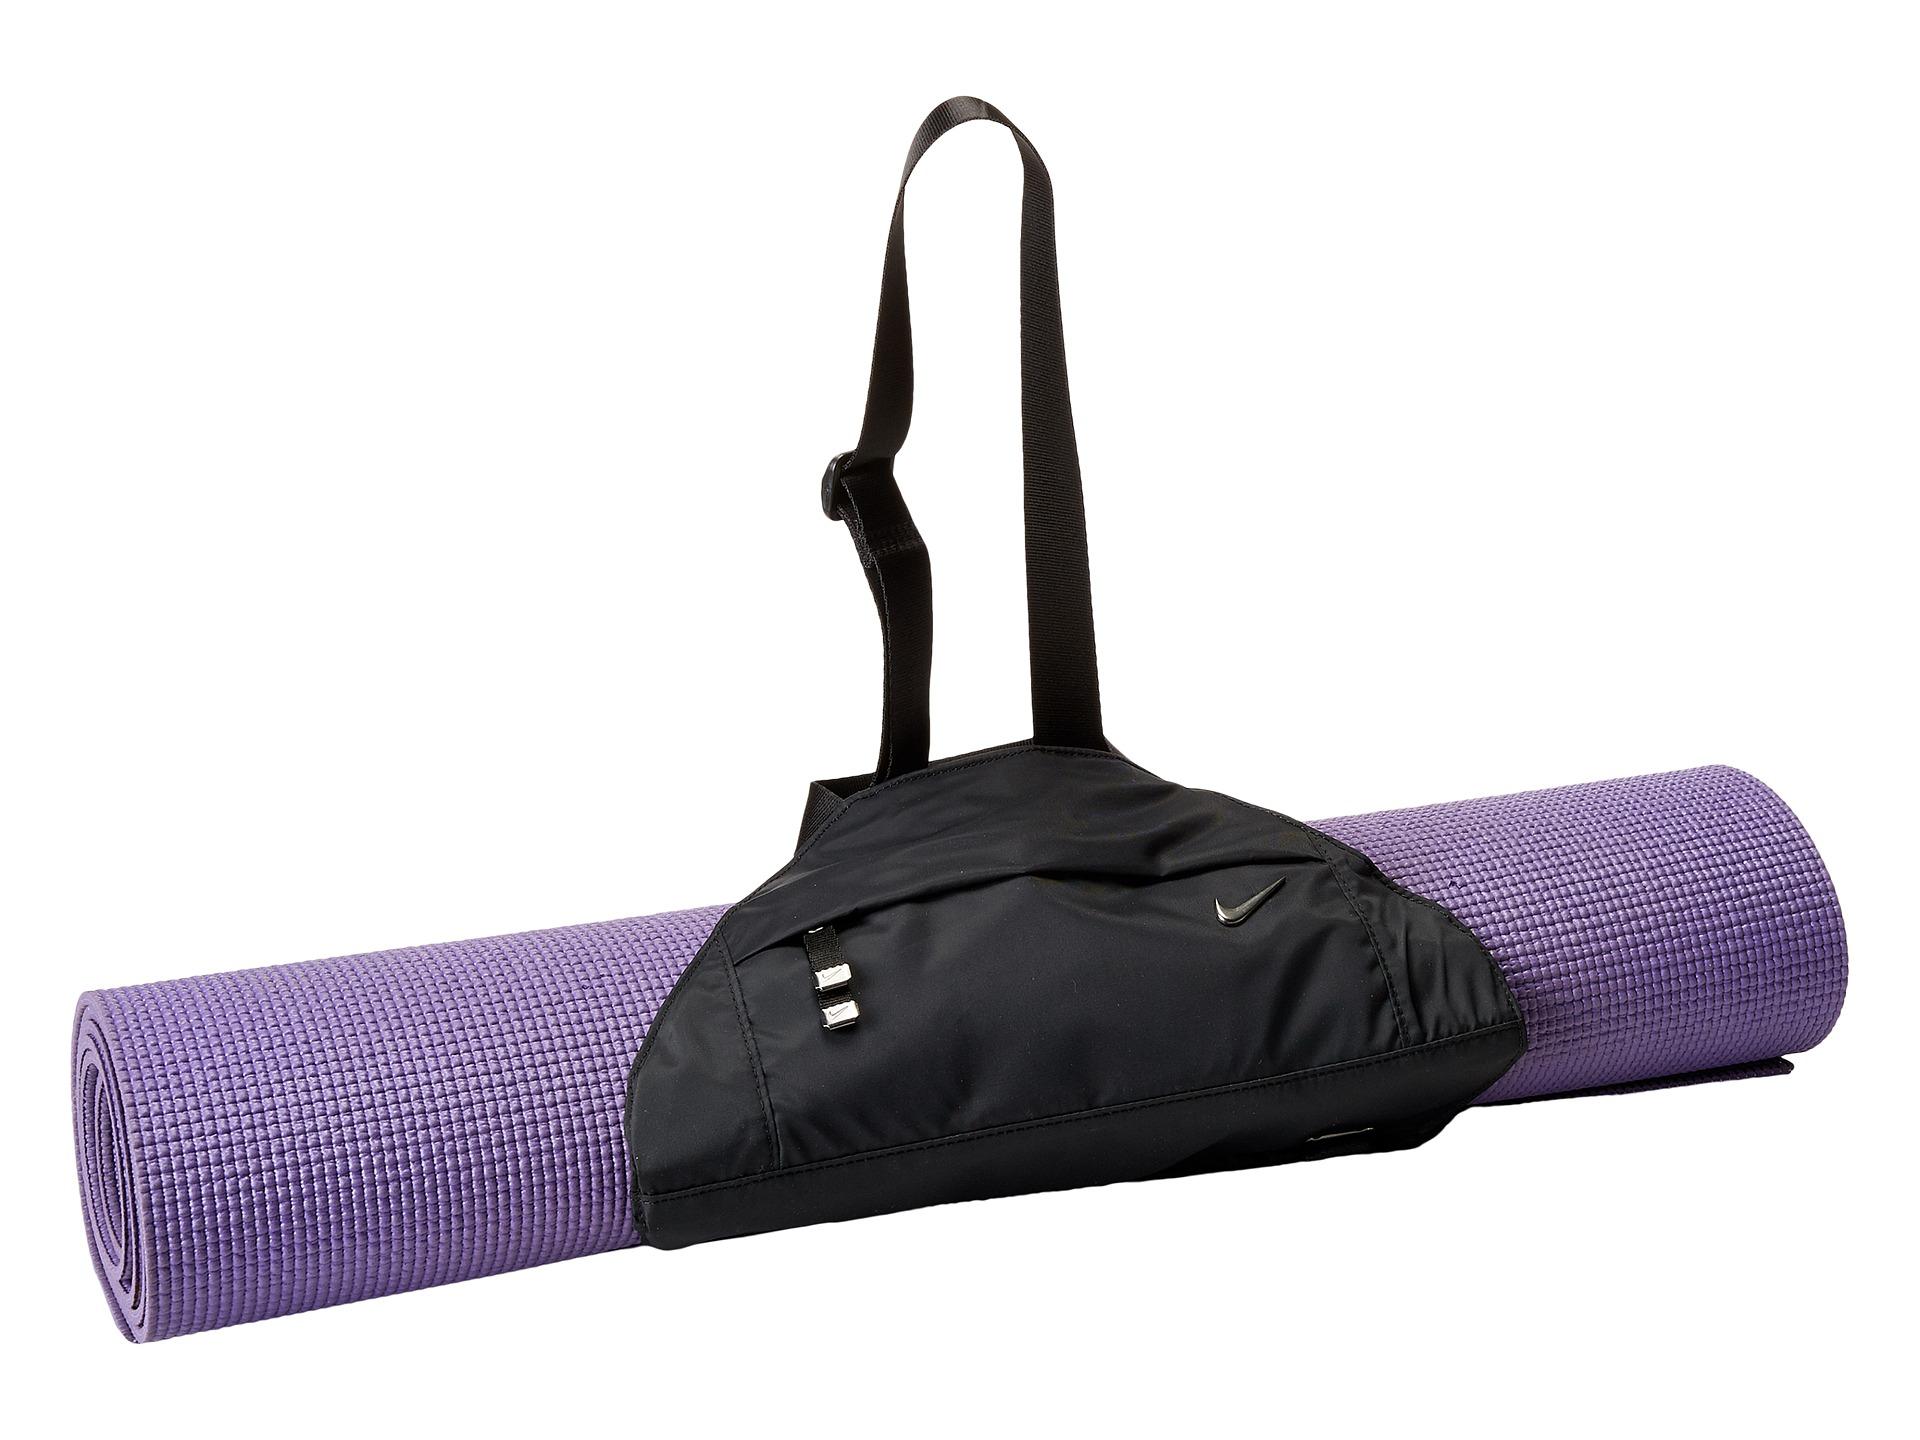 07e134103e Lyst - Nike Victory Yoga Sling in Black